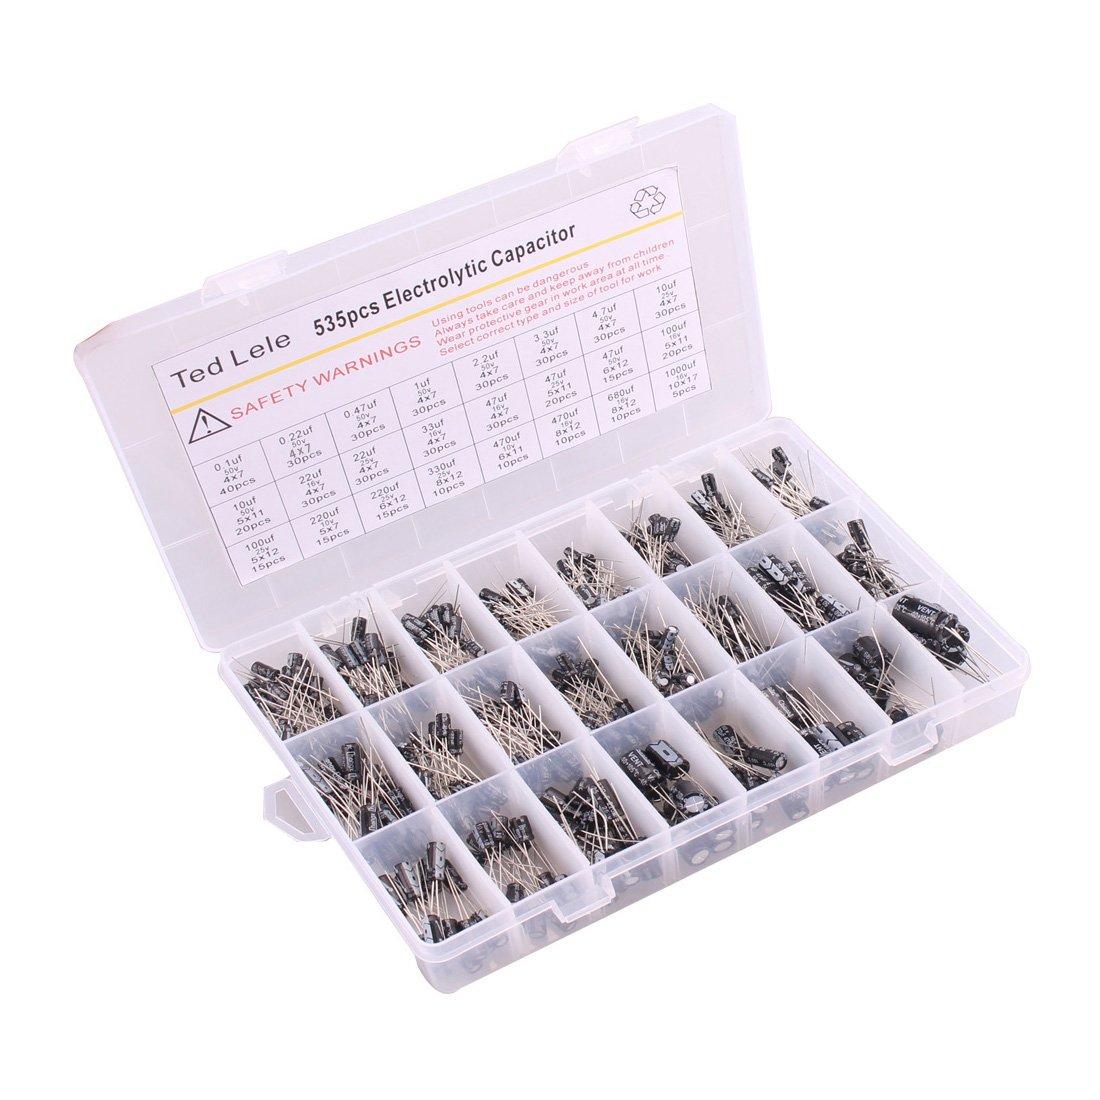 Ted Lele 535pcs(0.1uF-1000uF) Electrolytic Capacitors Assortment Kit, for Computer Motherboard, TV, Speaker, 24 Values (Black) (kit A)